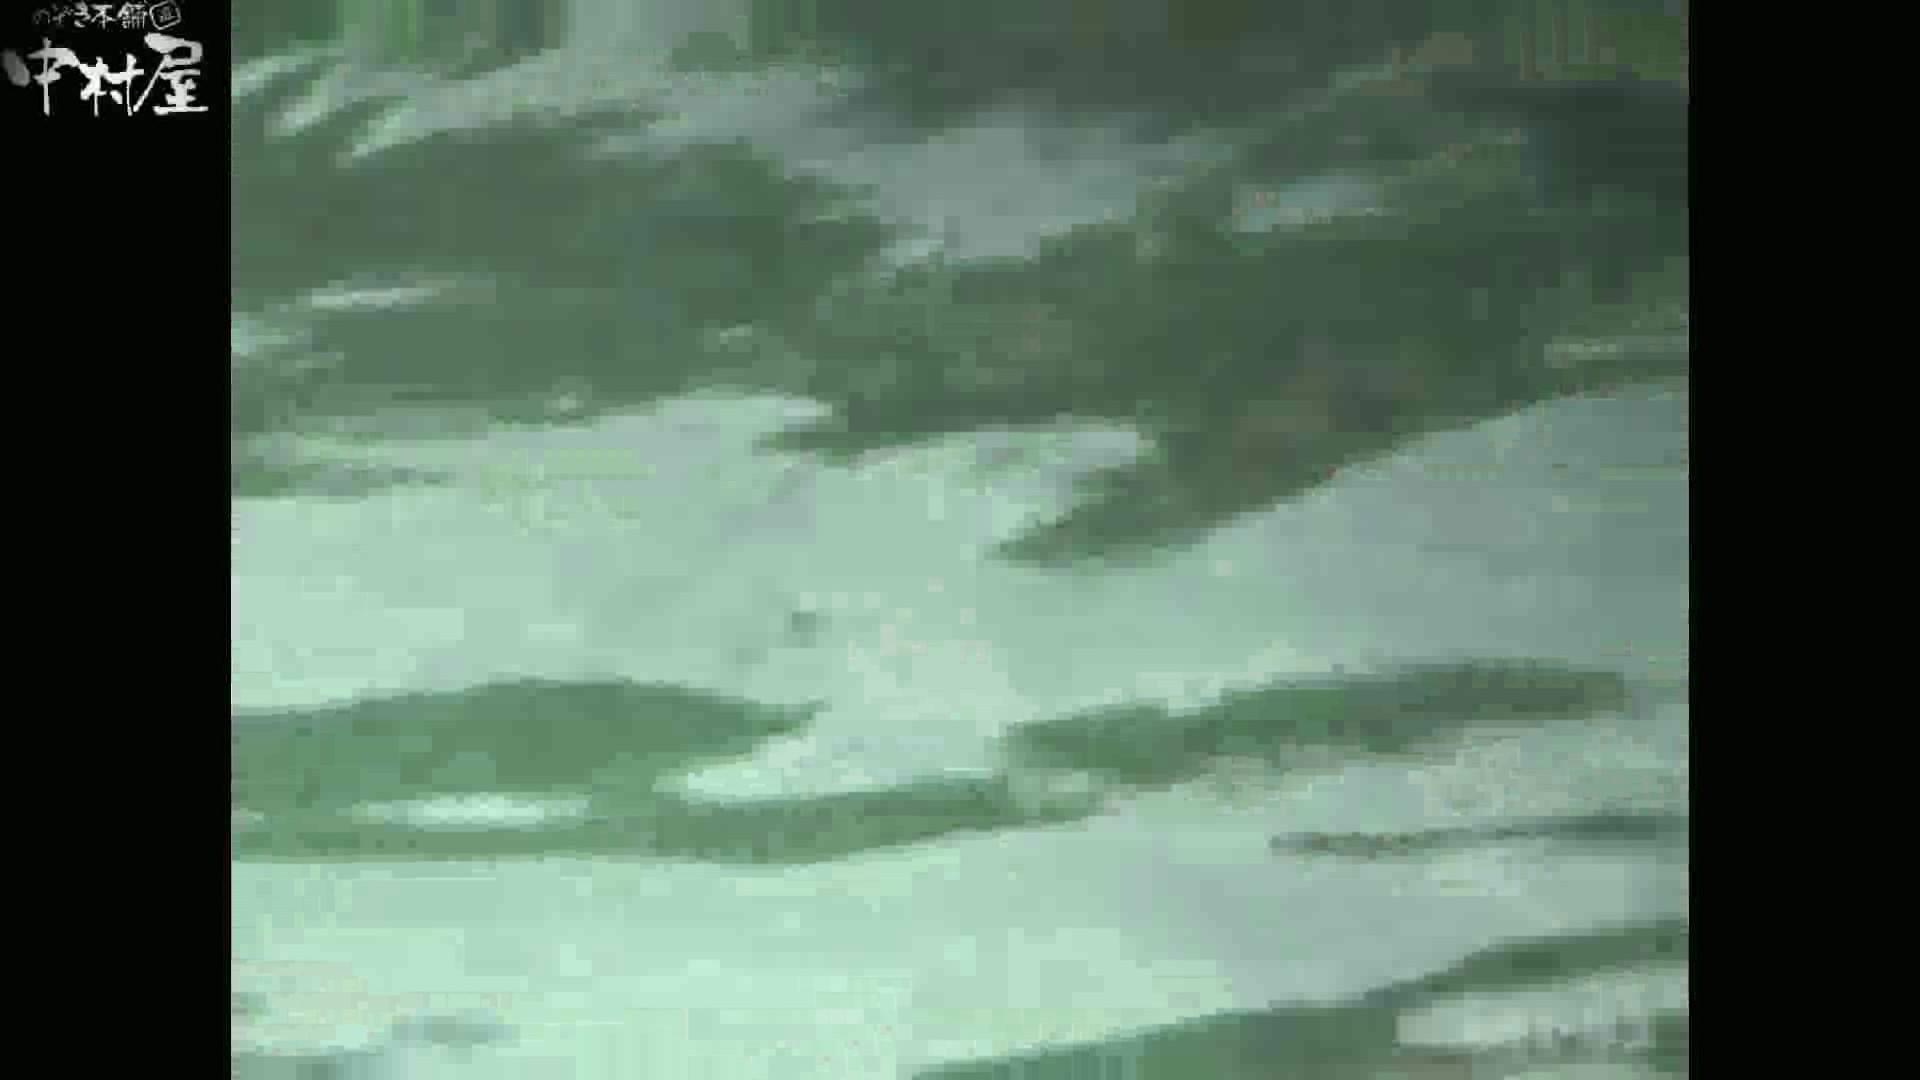 Aquaな露天風呂Vol.867潜入盗撮露天風呂参判湯 其の二 潜入 盗撮動画紹介 11pic 7